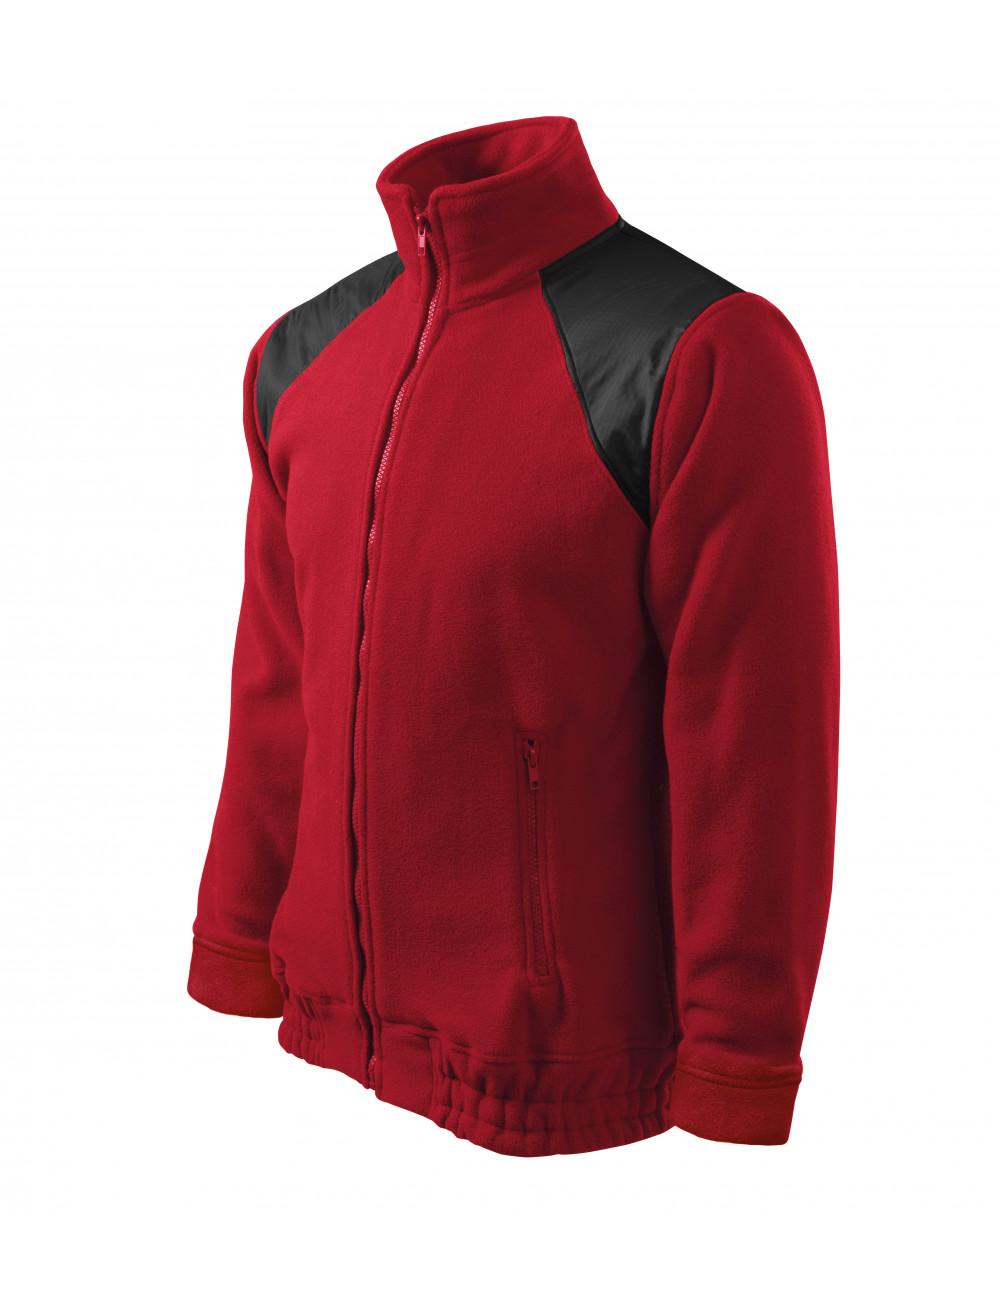 Adler RIMECK Polar unisex Jacket Hi-Q 506 marlboro czerwony